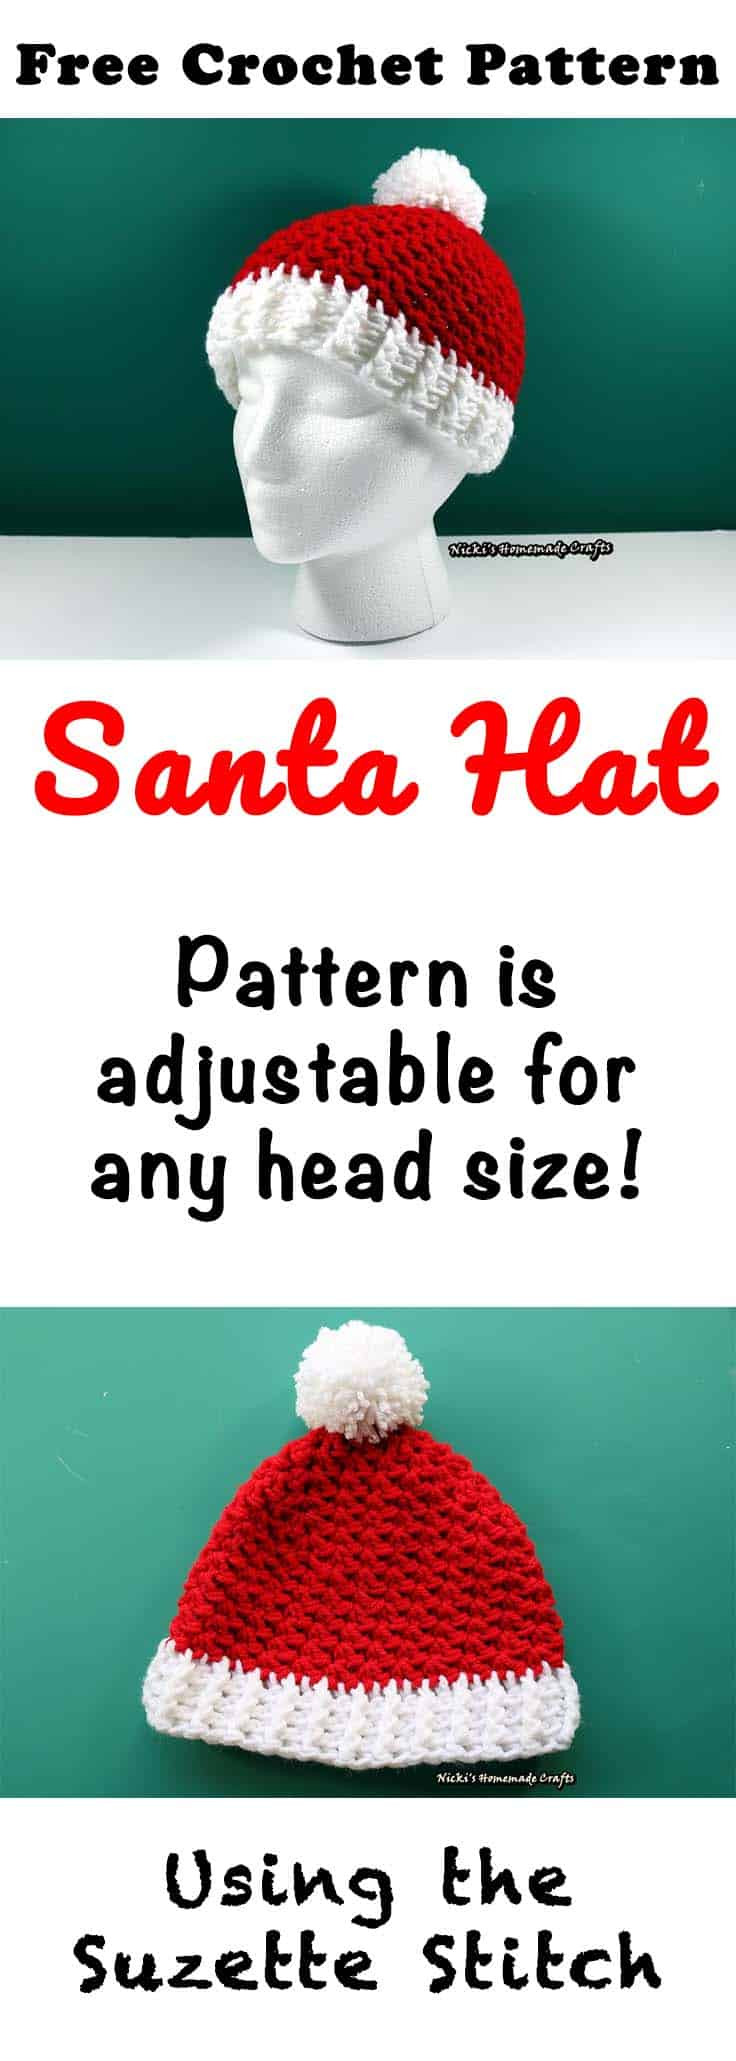 Santa Hat with Pom-pom - Free Crochet Pattern by Nicki's Homemade Crafts #crochet #Santa #christmas #hat #beanie #suzette #stitch #beginner #easy